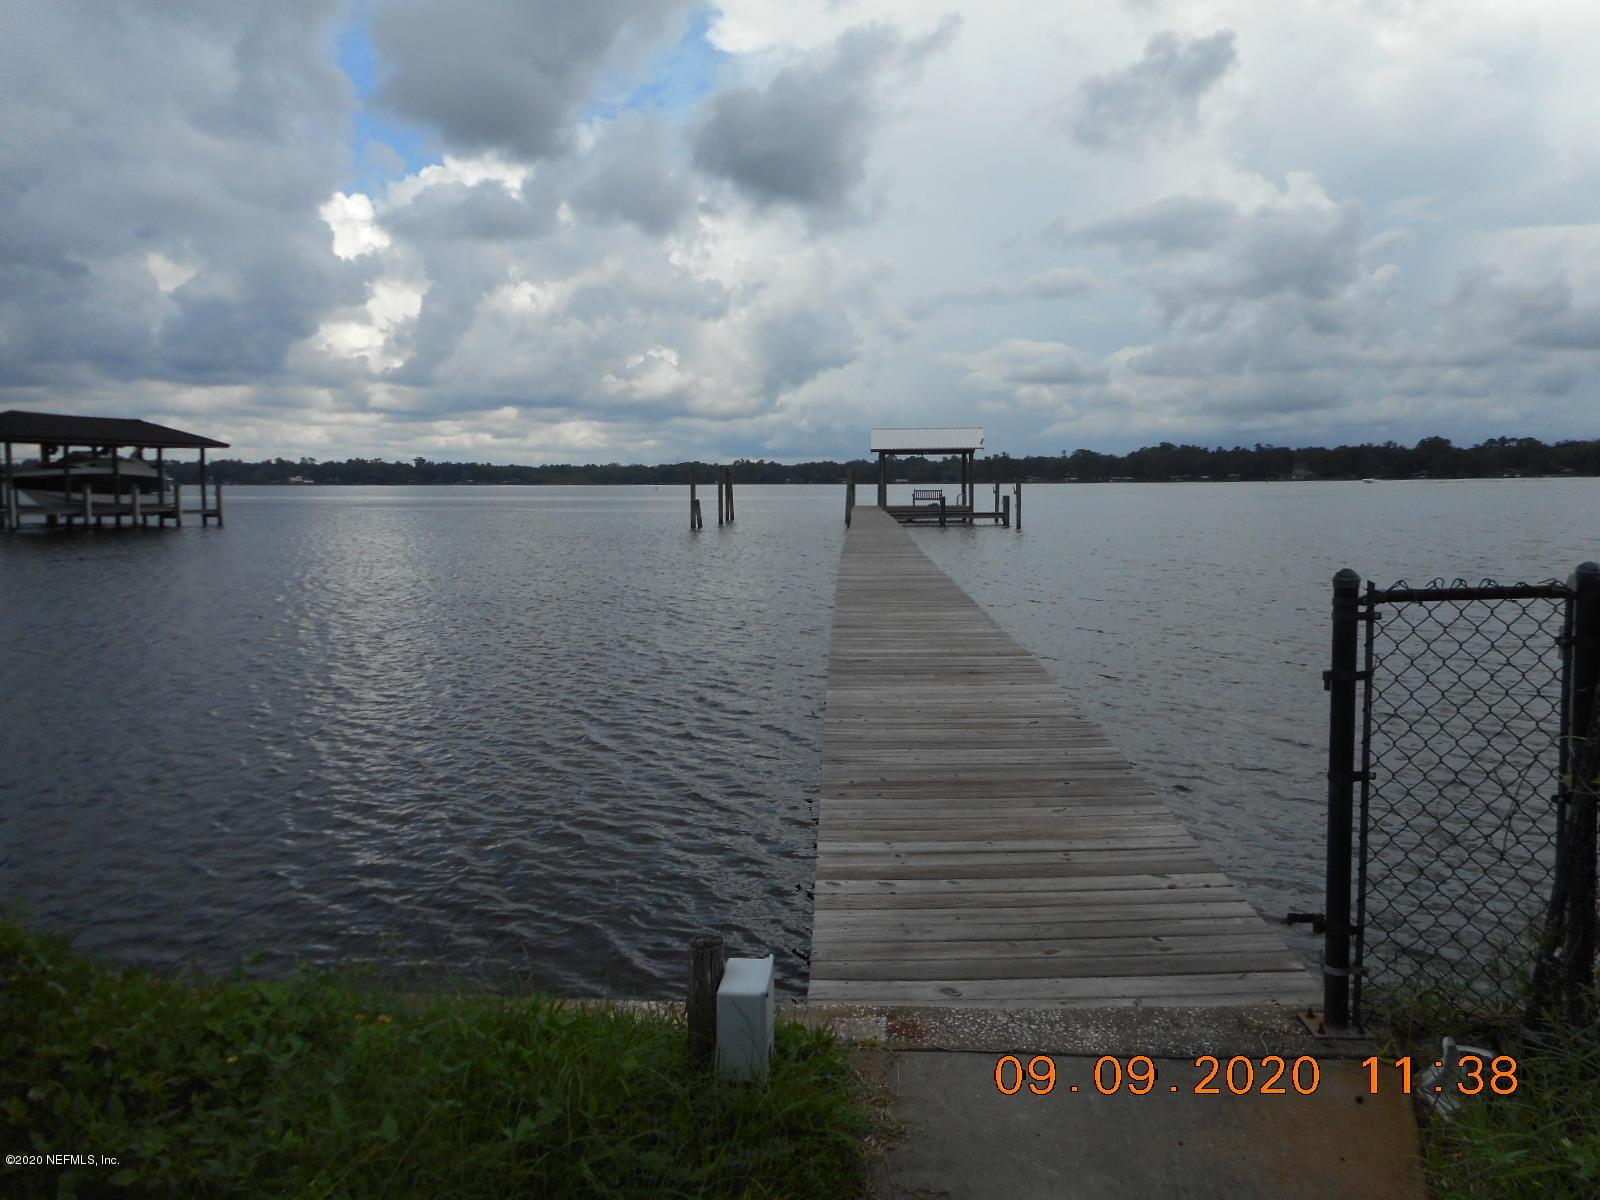 585 CREIGHTON, FLEMING ISLAND, FLORIDA 32003, 4 Bedrooms Bedrooms, ,2 BathroomsBathrooms,Residential,For sale,CREIGHTON,1072445